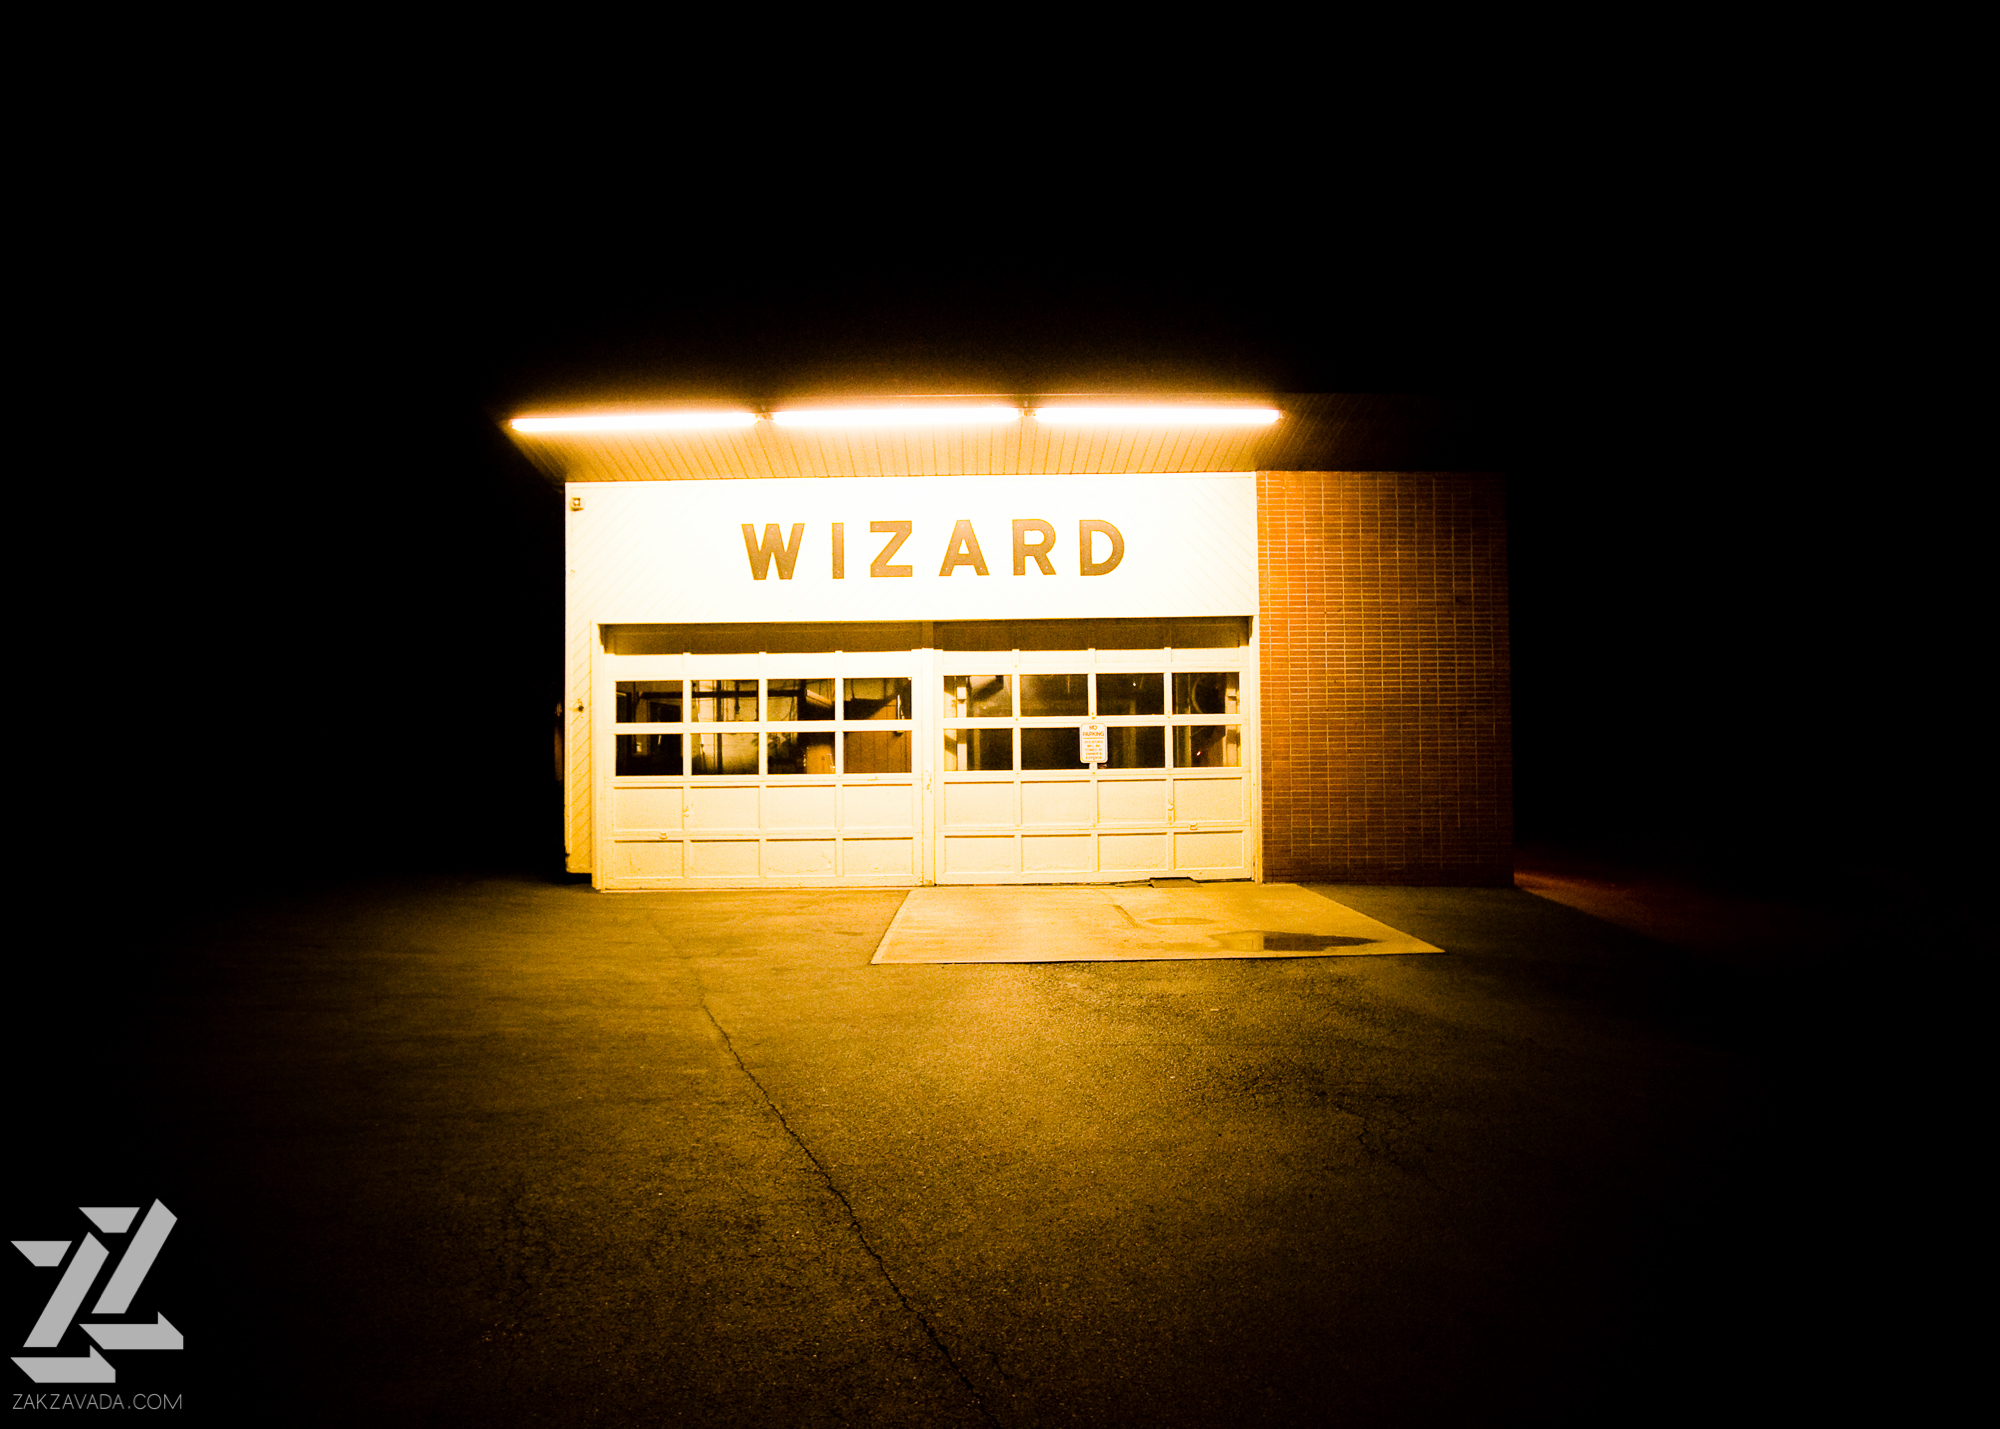 The Wizard. Scranton, PA.